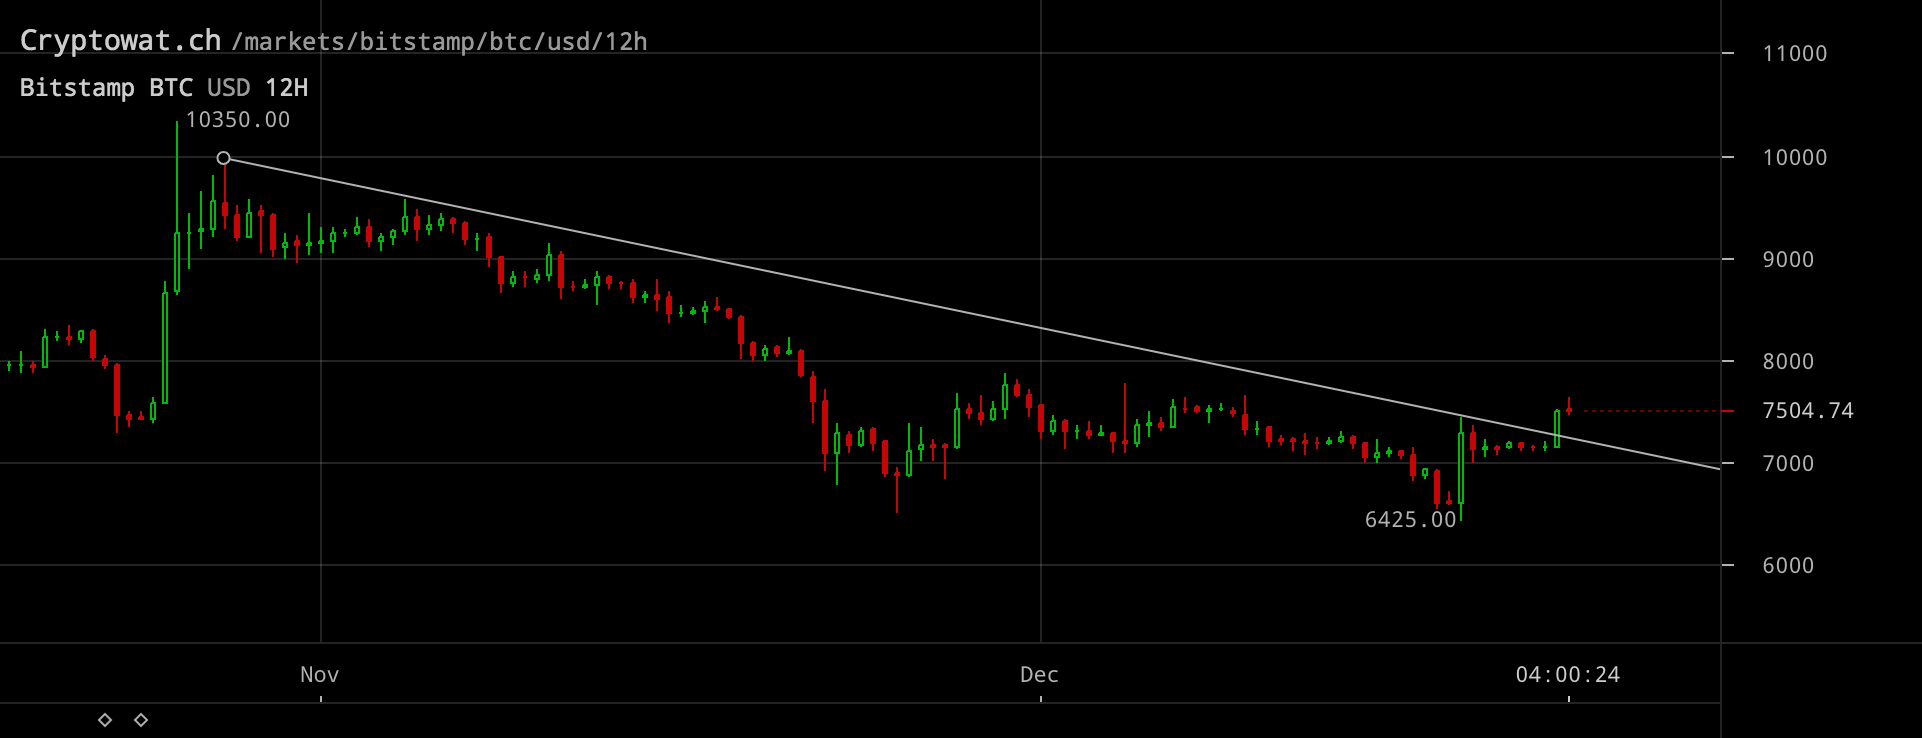 Bitcoinpriset på Bitstamp den 23 december 2019.